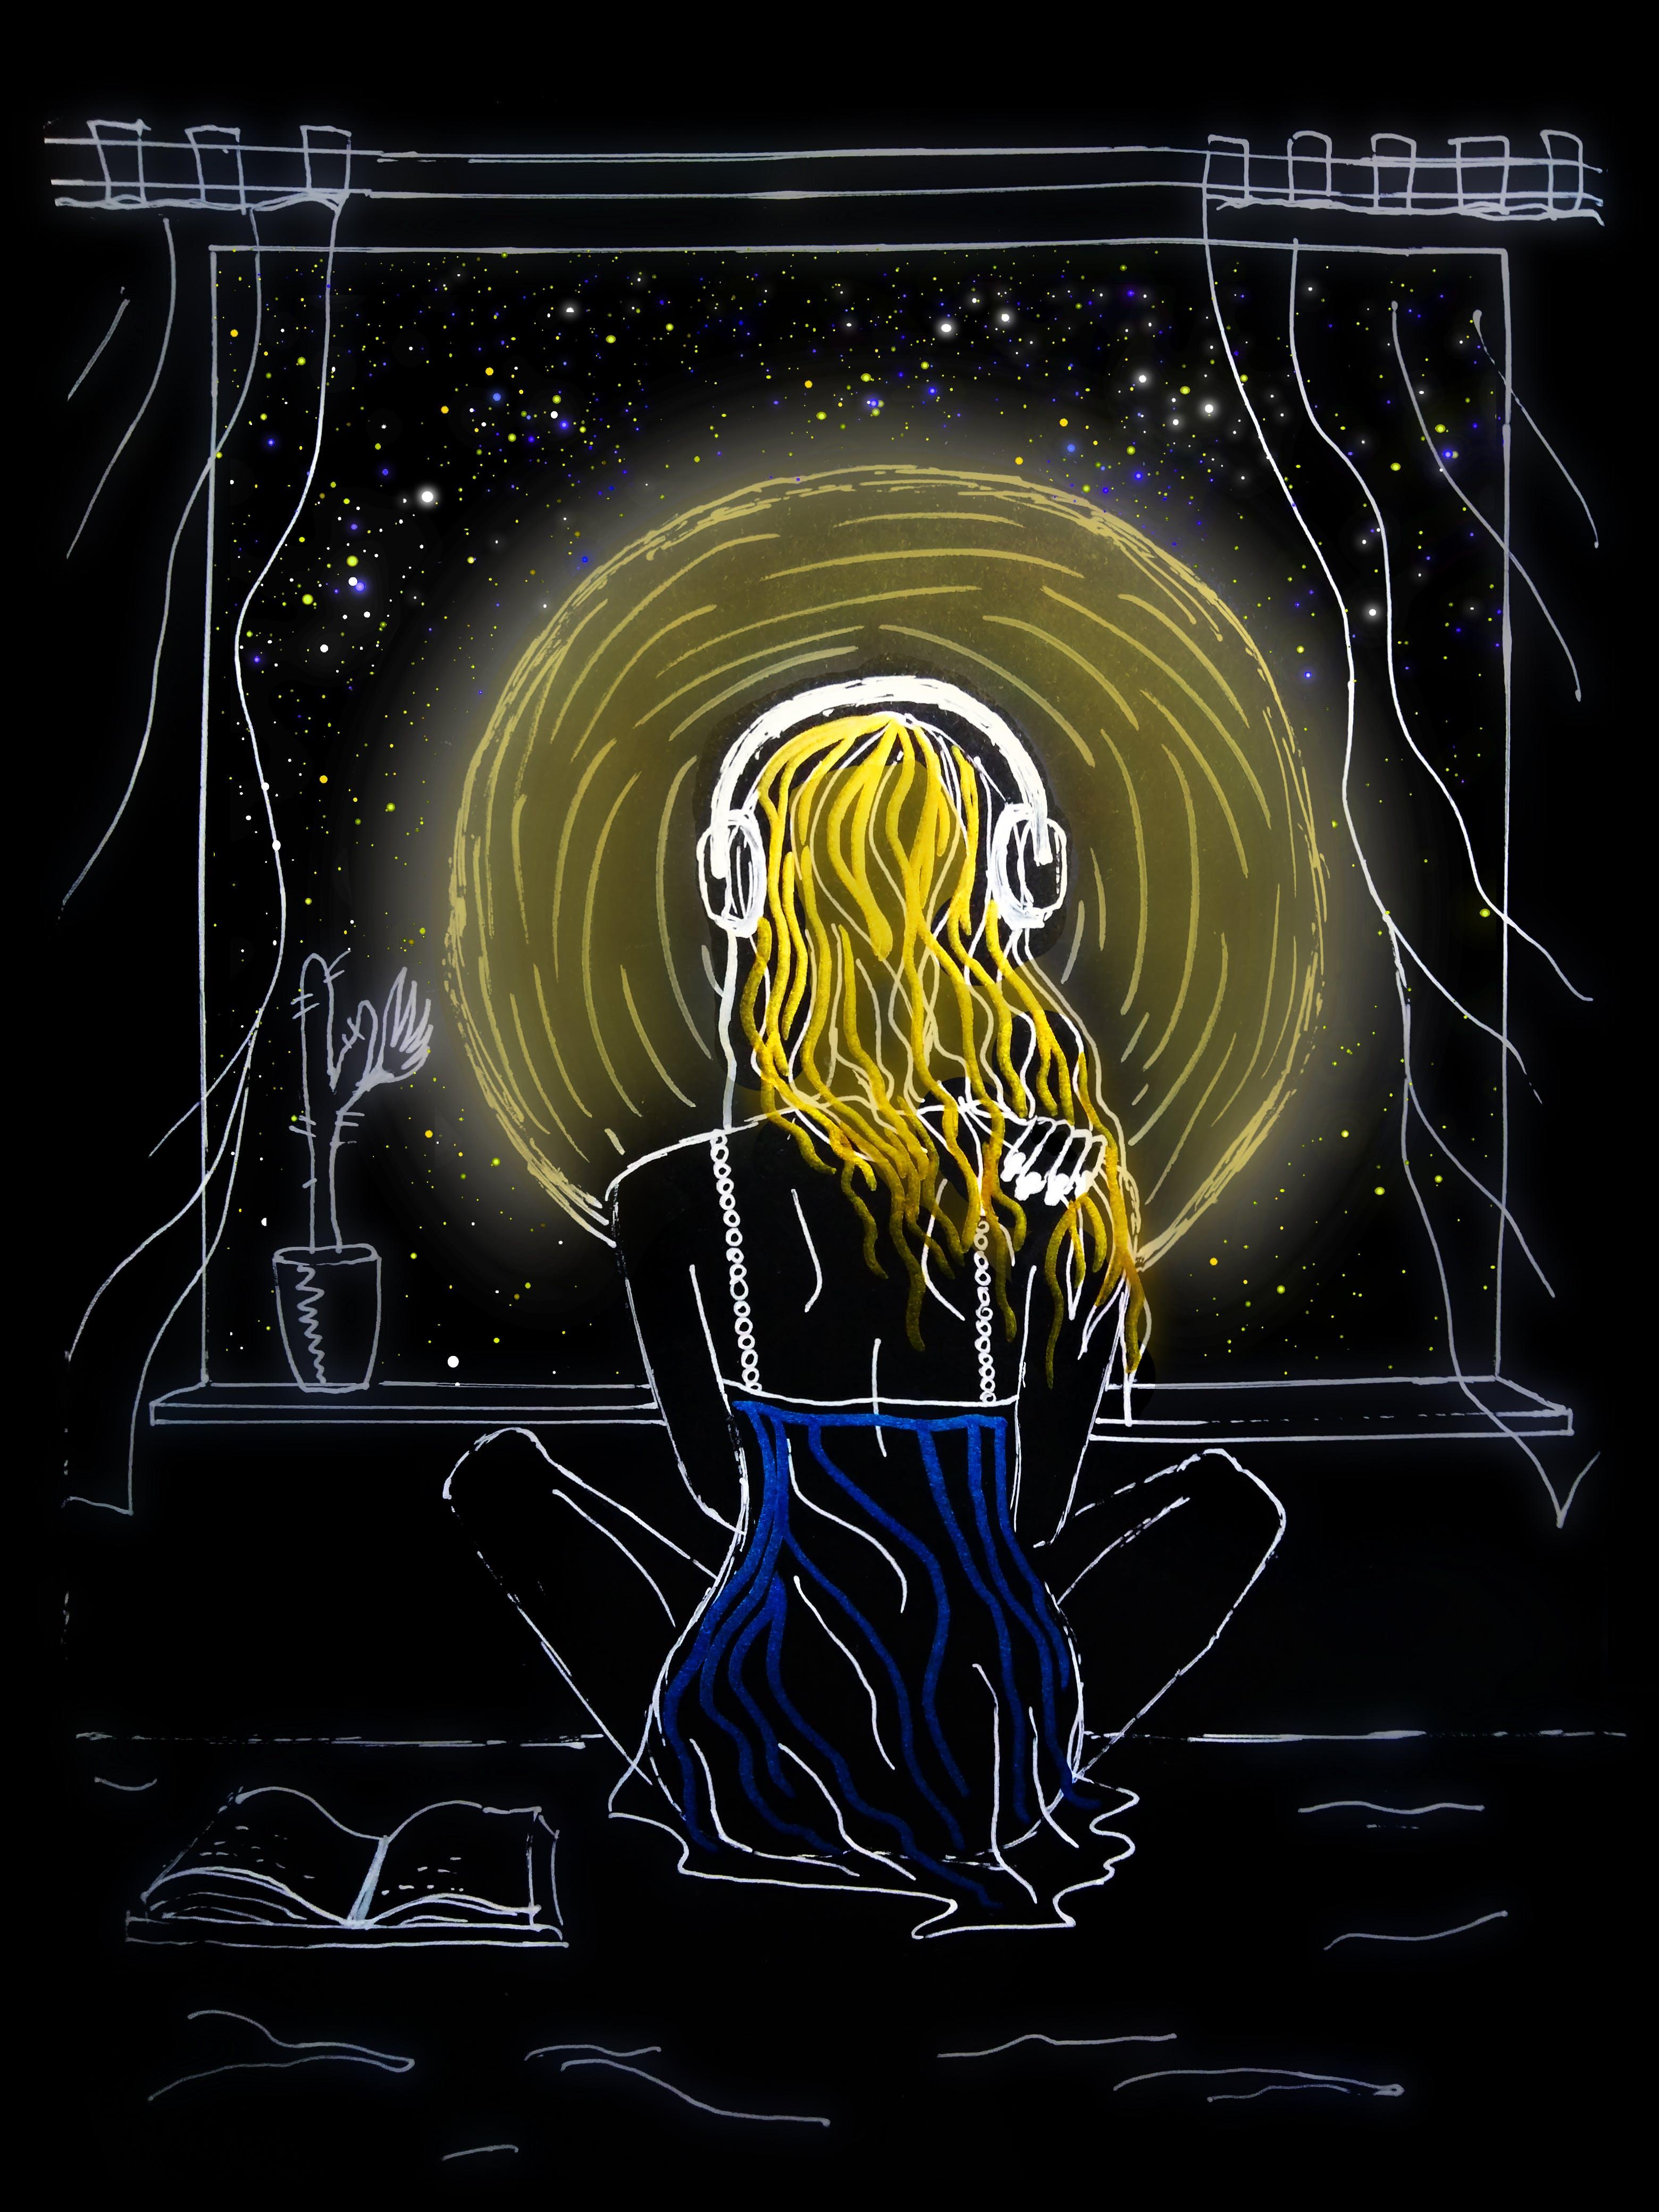 Free stock photo of drawing, night